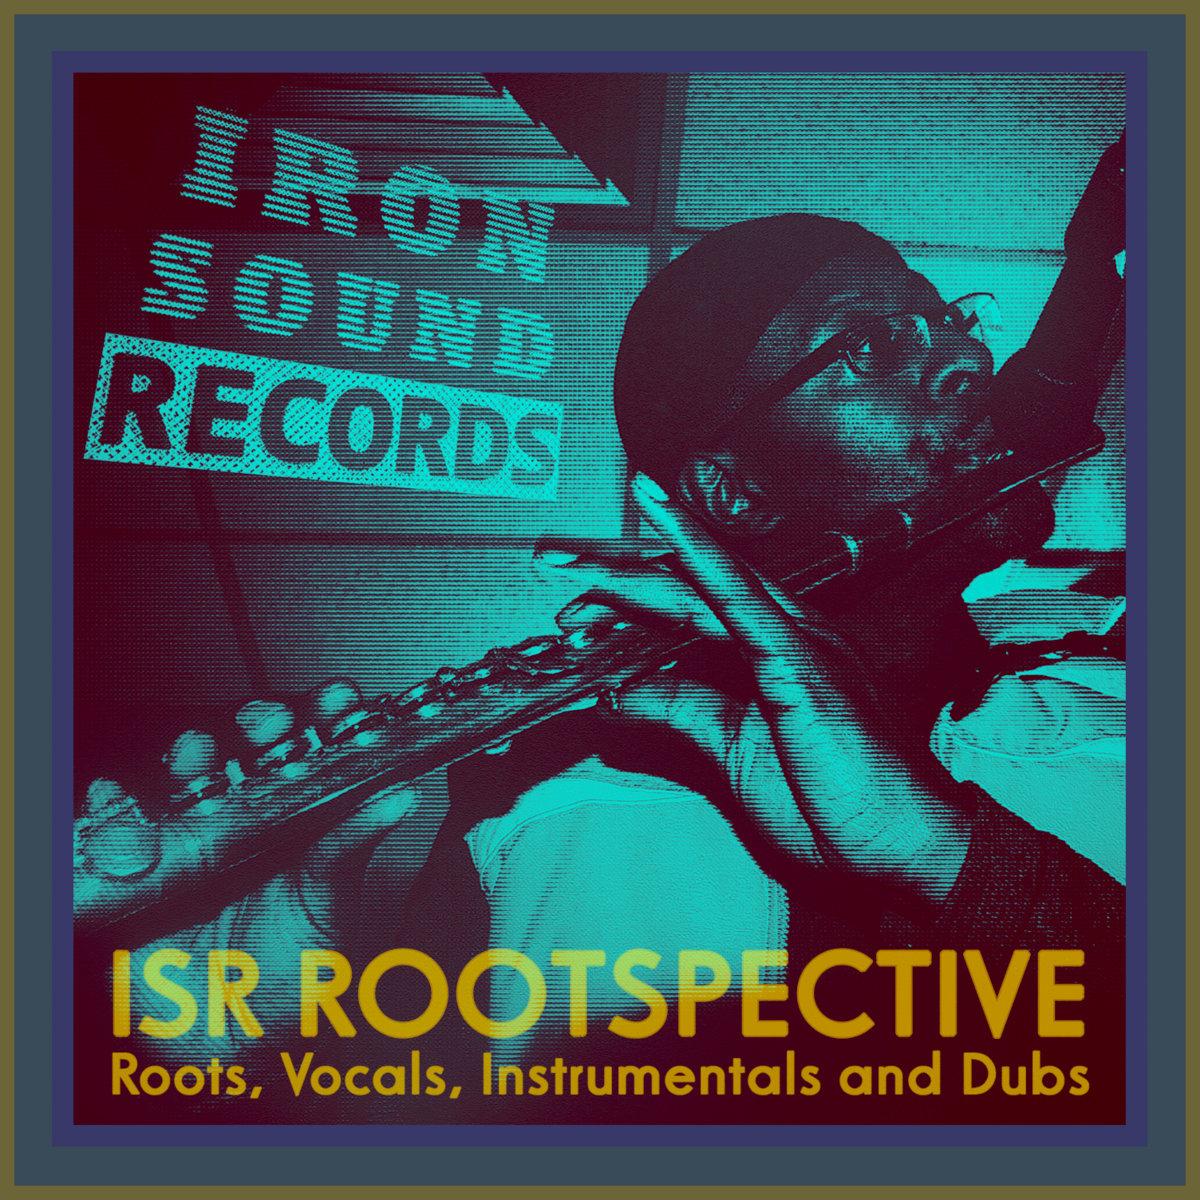 ISR Rootspective 2018